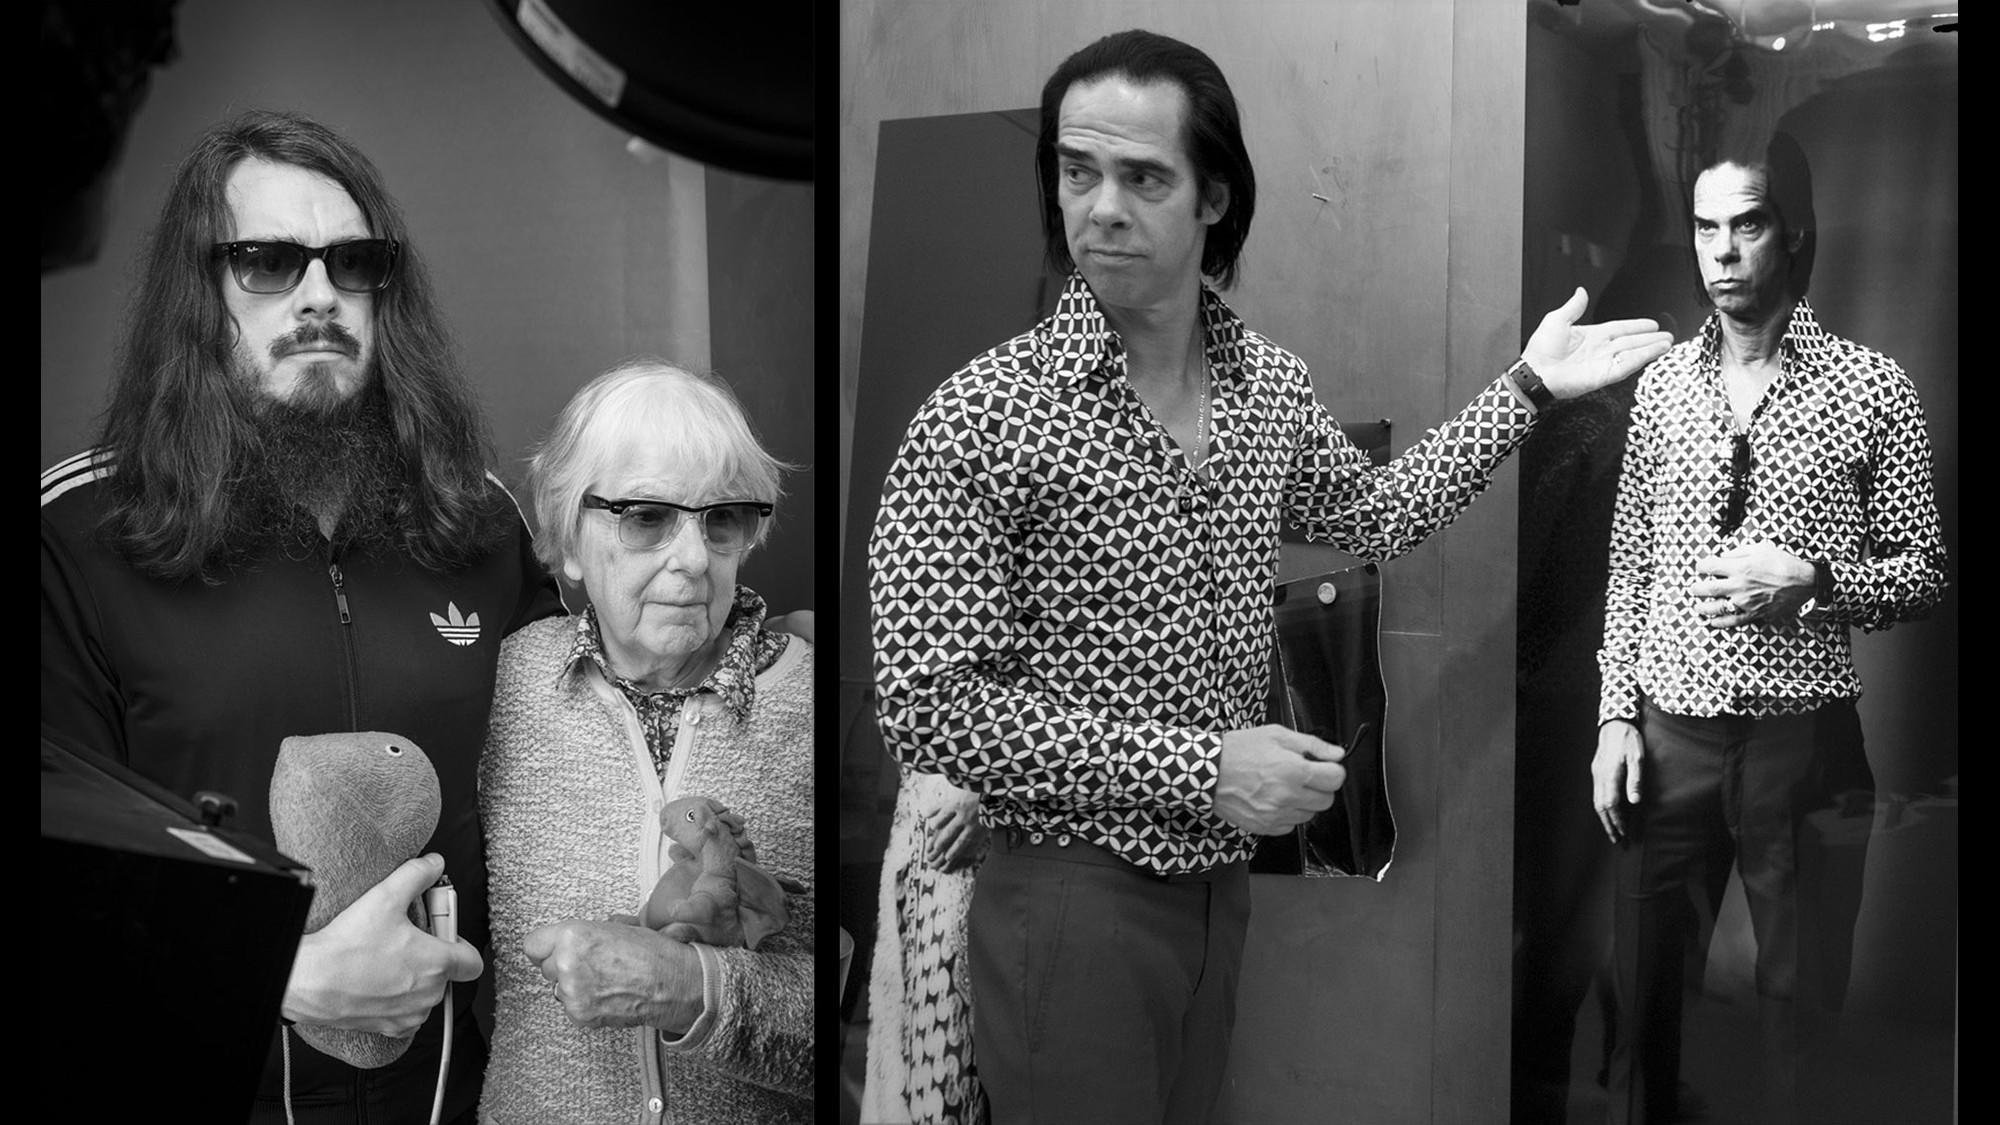 7_Portraitsessions Johnathan & Brigitte Meese und Nick Cave